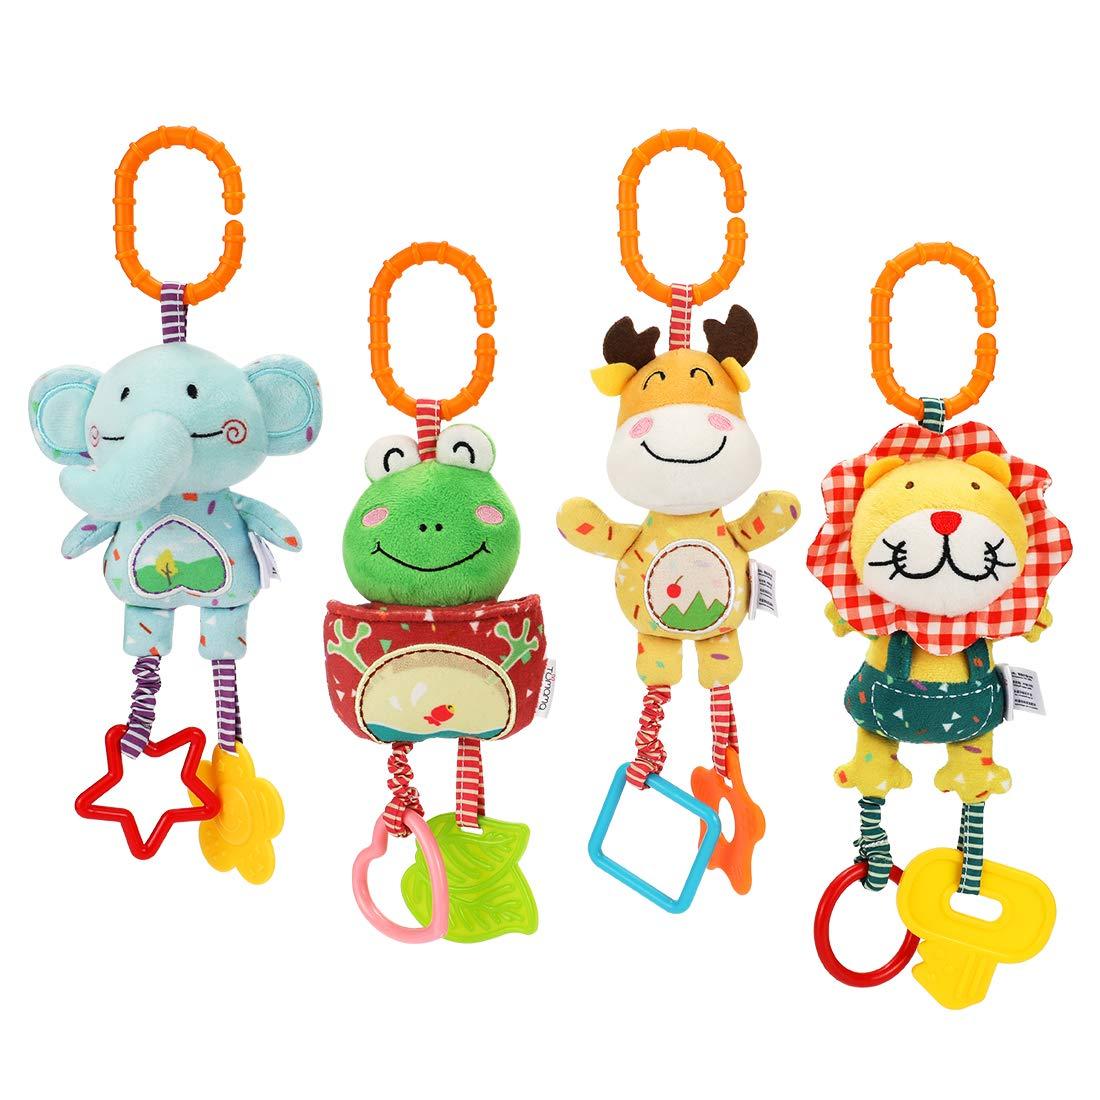 TUMAMA 4 Pack Baby Handbells Rattles Soft Plush Development Toys for Newborn Infant Birthday Present by TUMAMA